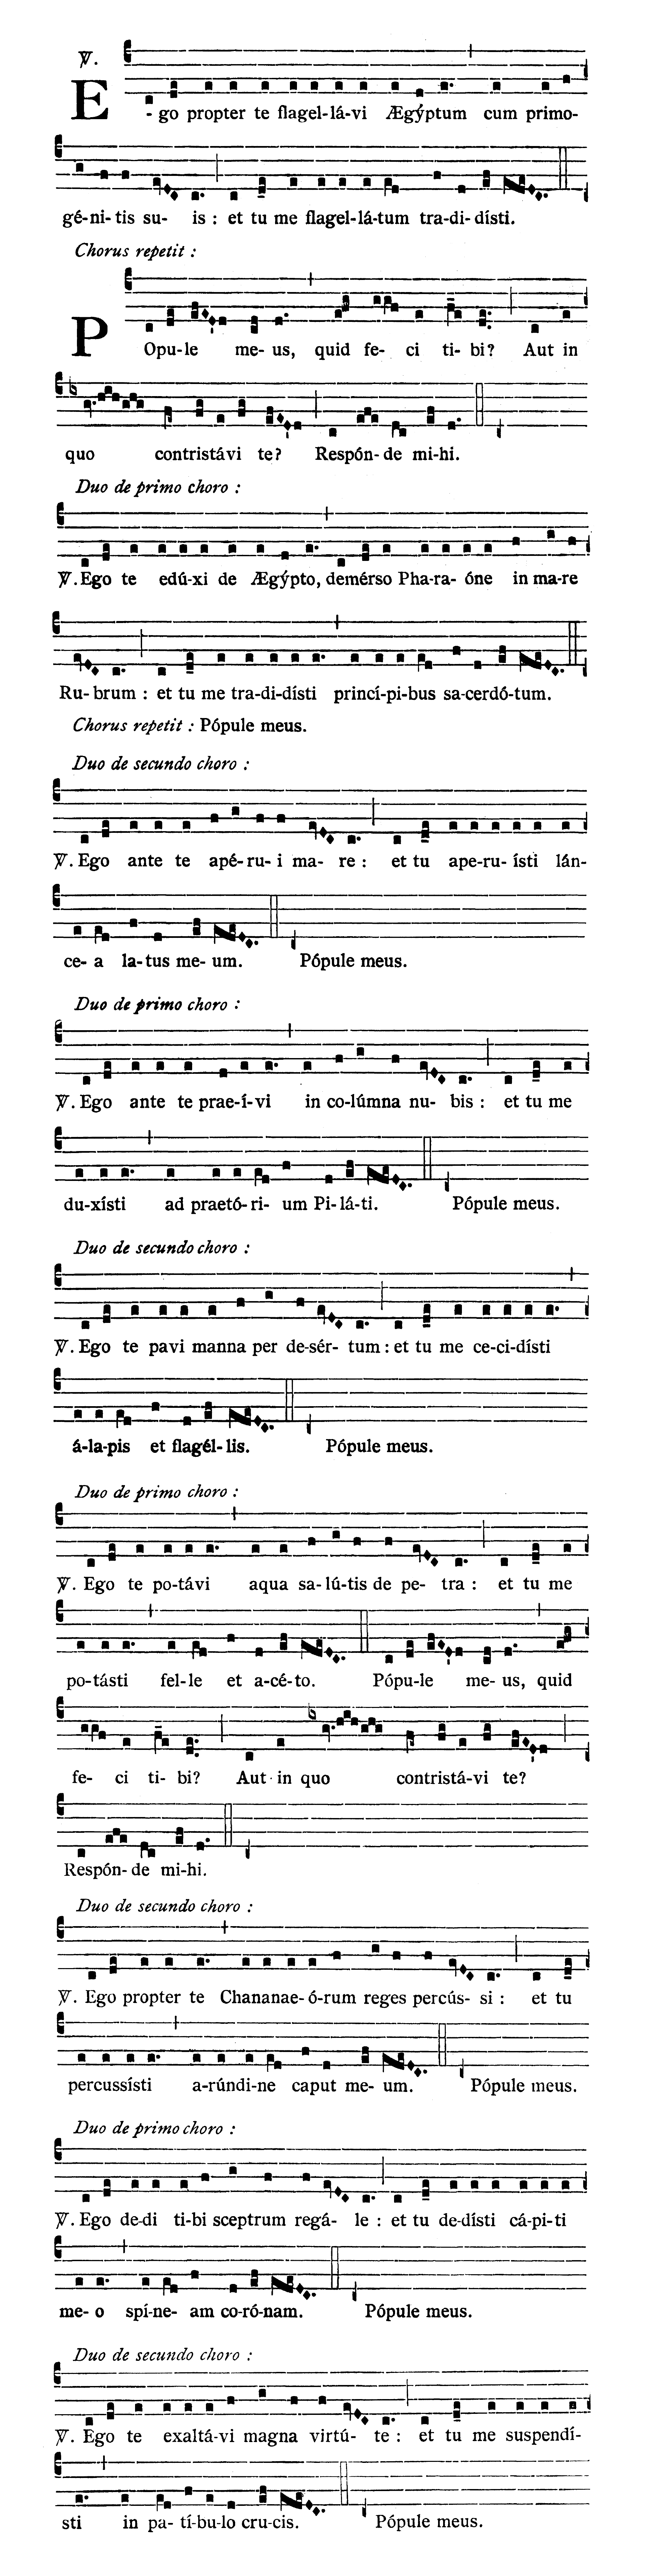 Feria VI in Passione et Morte Domini (Good Friday) - Ego propter te flagellavi